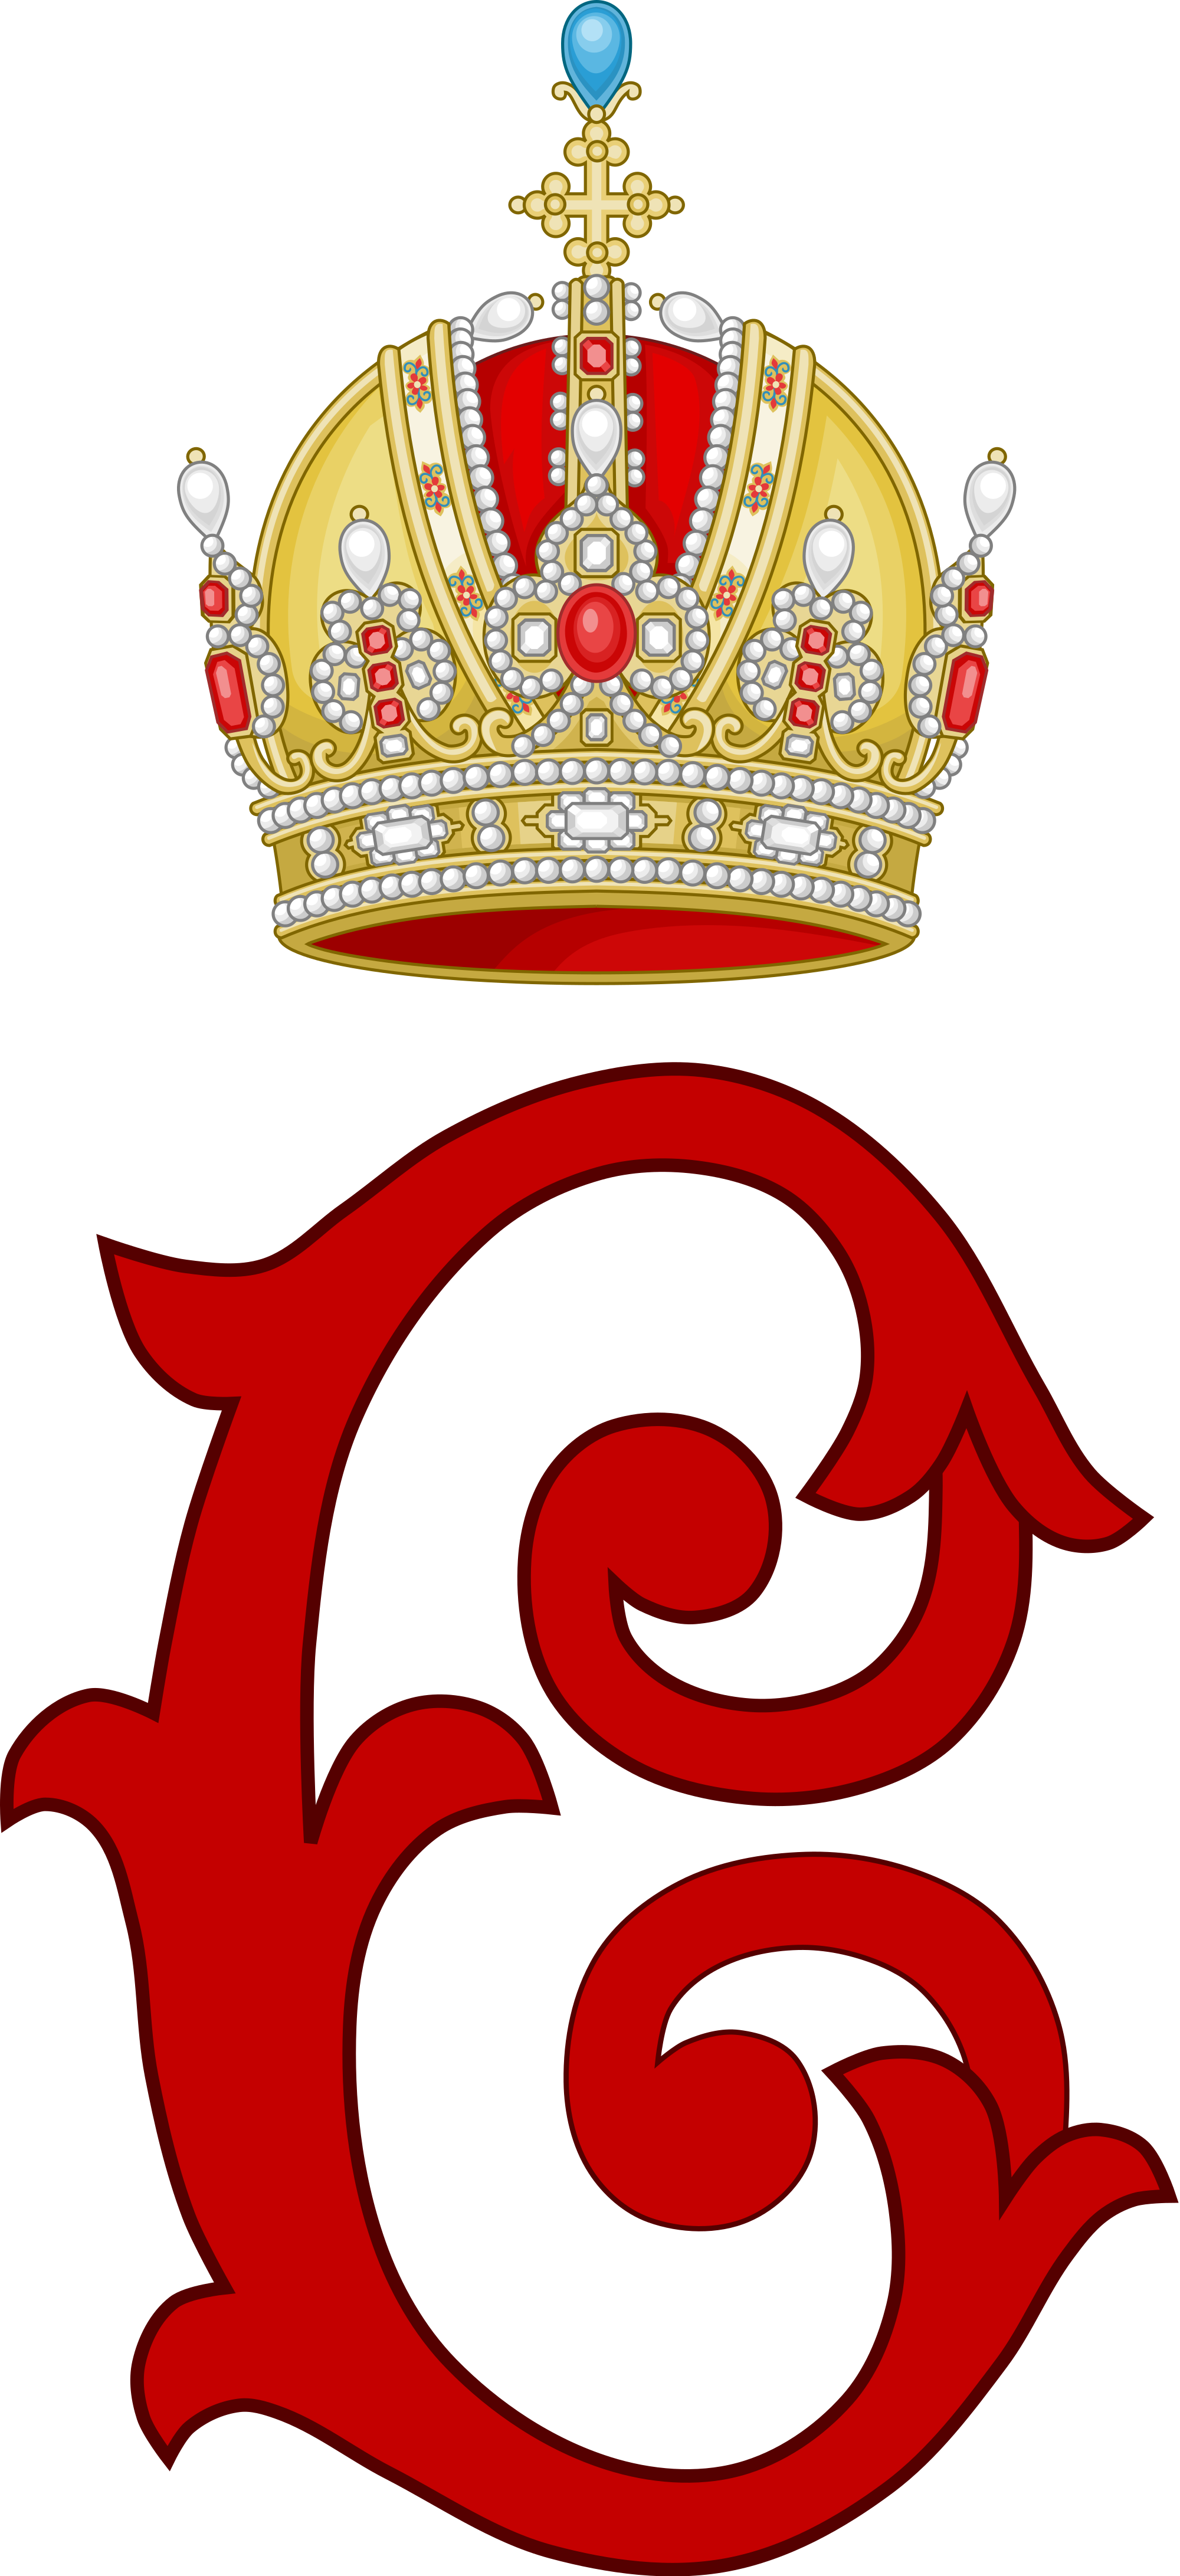 File:Imperial Monogram of Emperor Charles I of Austria, Variant 2.